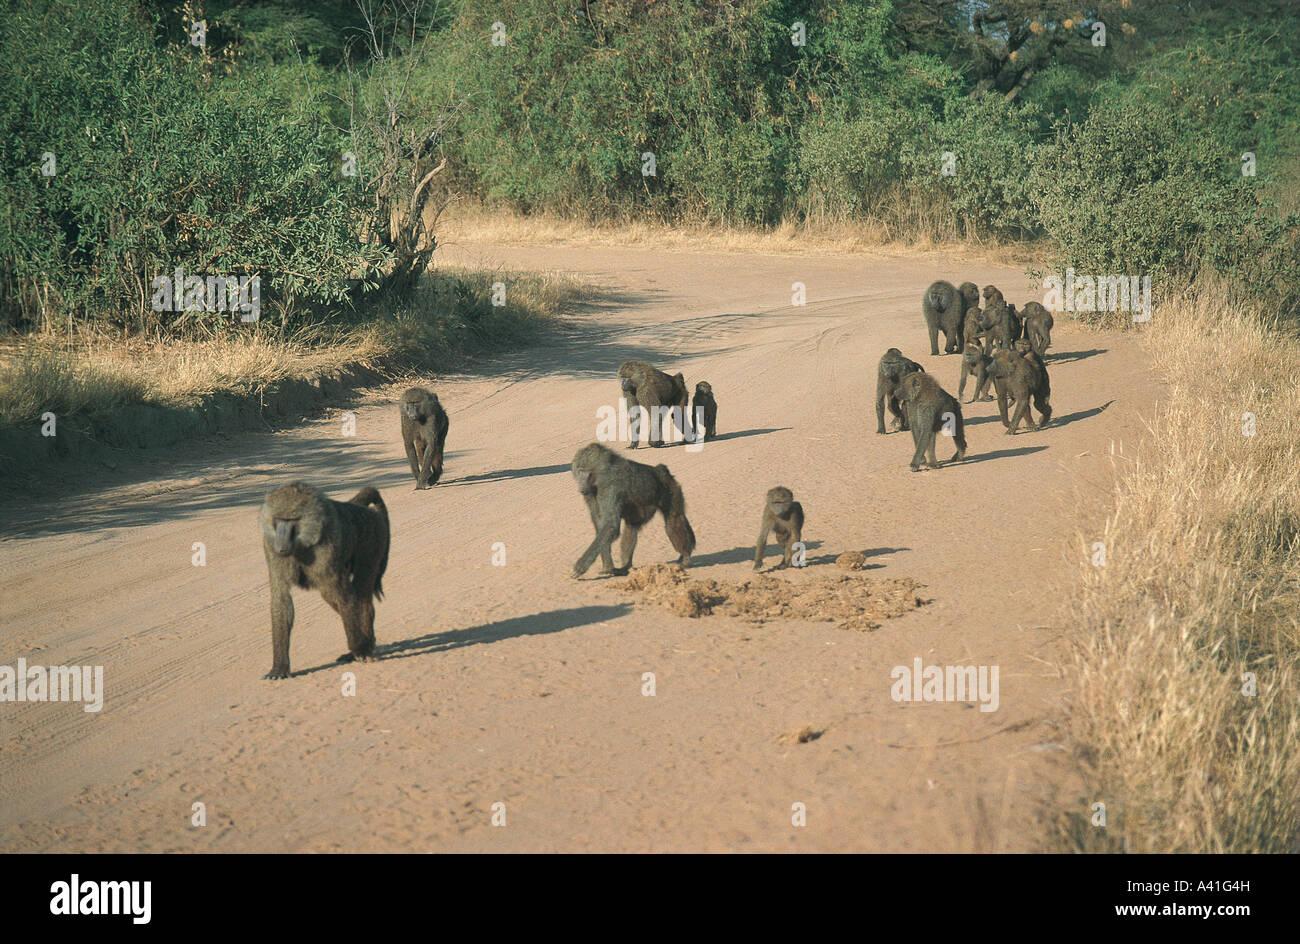 Troop of Olive Baboons walking on dirt track road in Samburu National Reserve Kenya East Africa - Stock Image